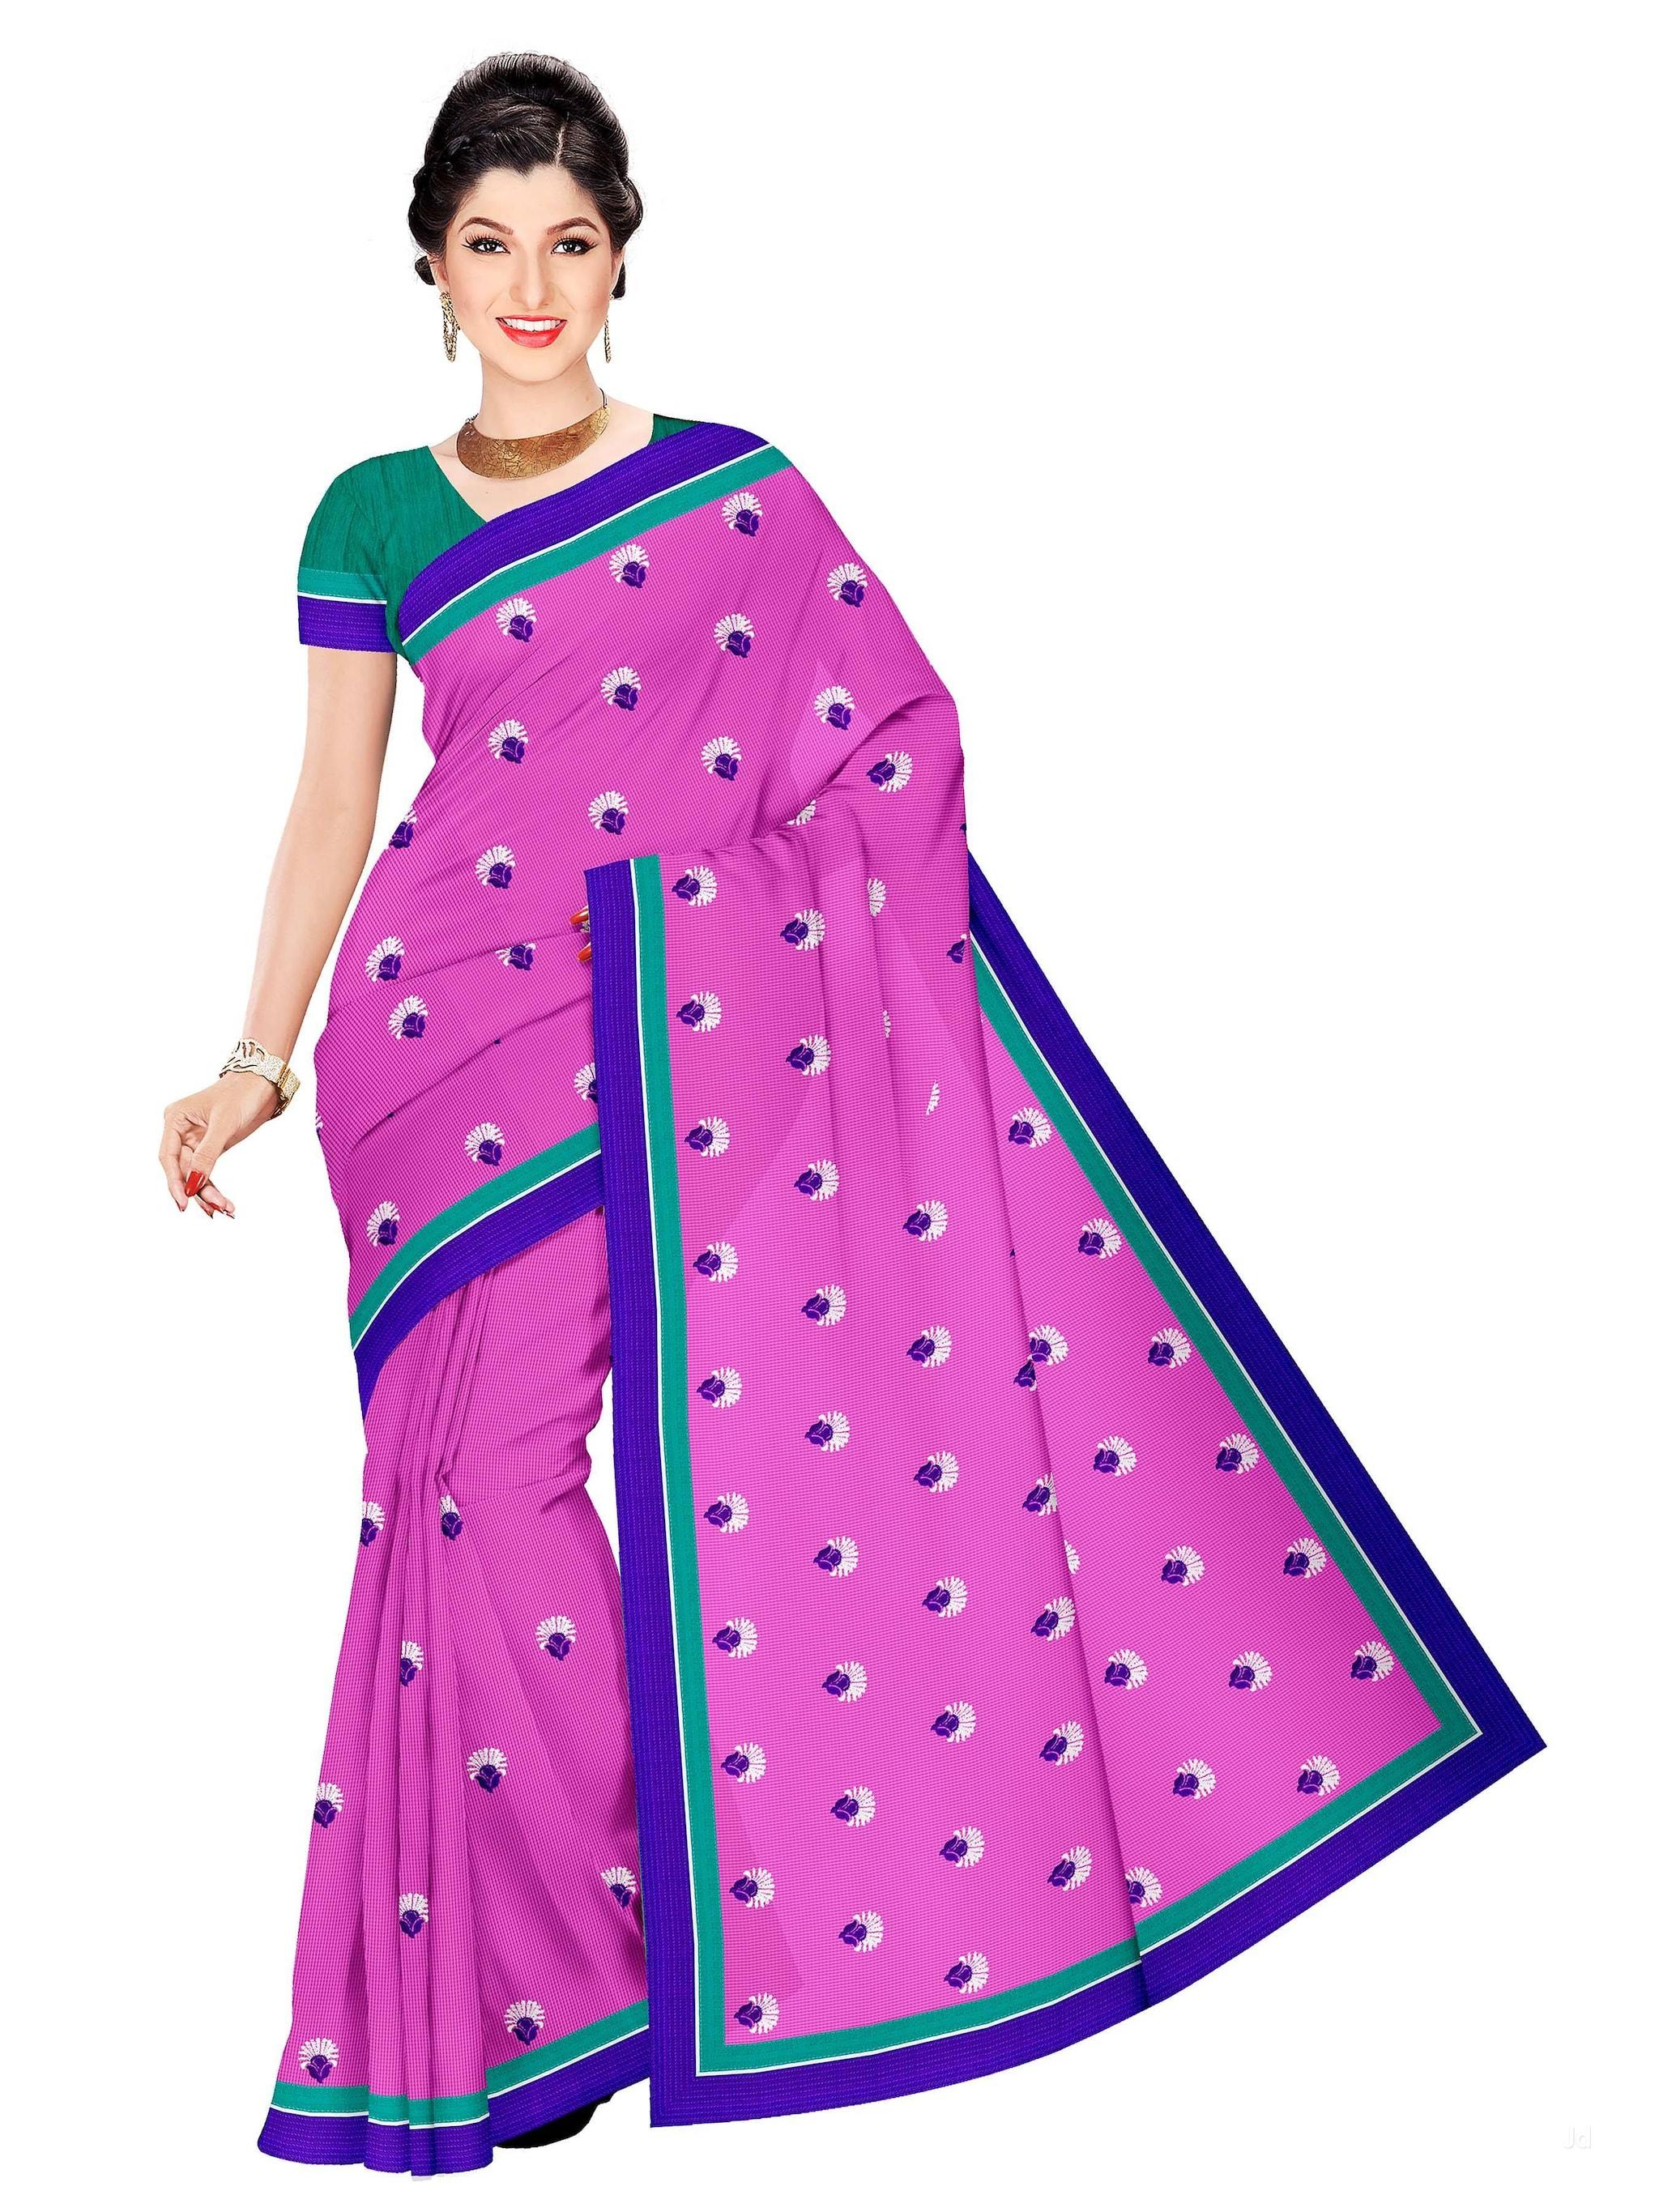 686629ffe8 Top 30 Super Net Saree Wholesalers in Burrabazar, Kolkata - Justdial